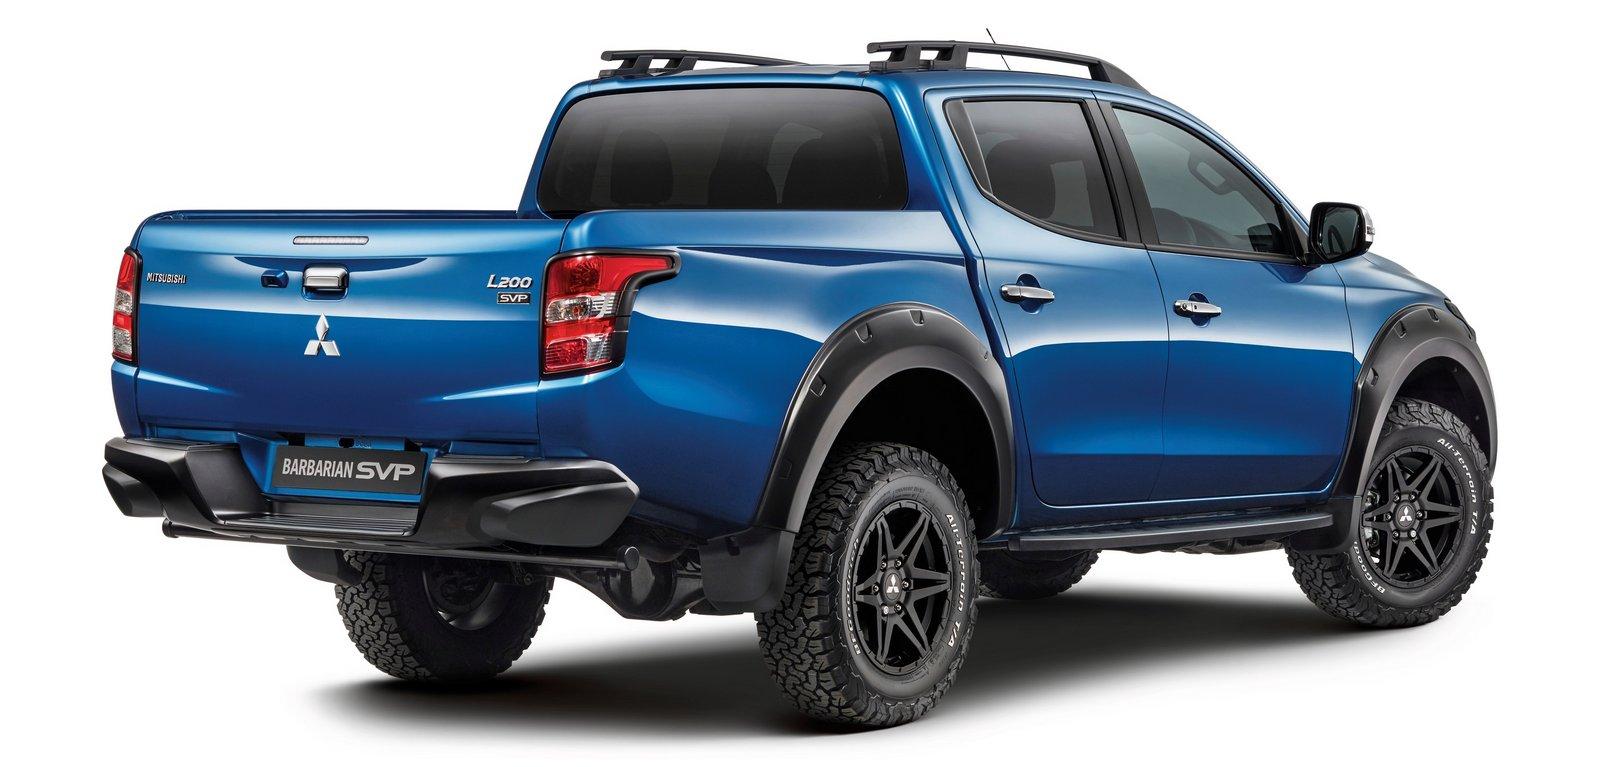 2015 - [Mitsubishi / Fiat] L200 - Triton / Fullback - Page 3 Mitsubishi-L200-Barbarian-SVP-1